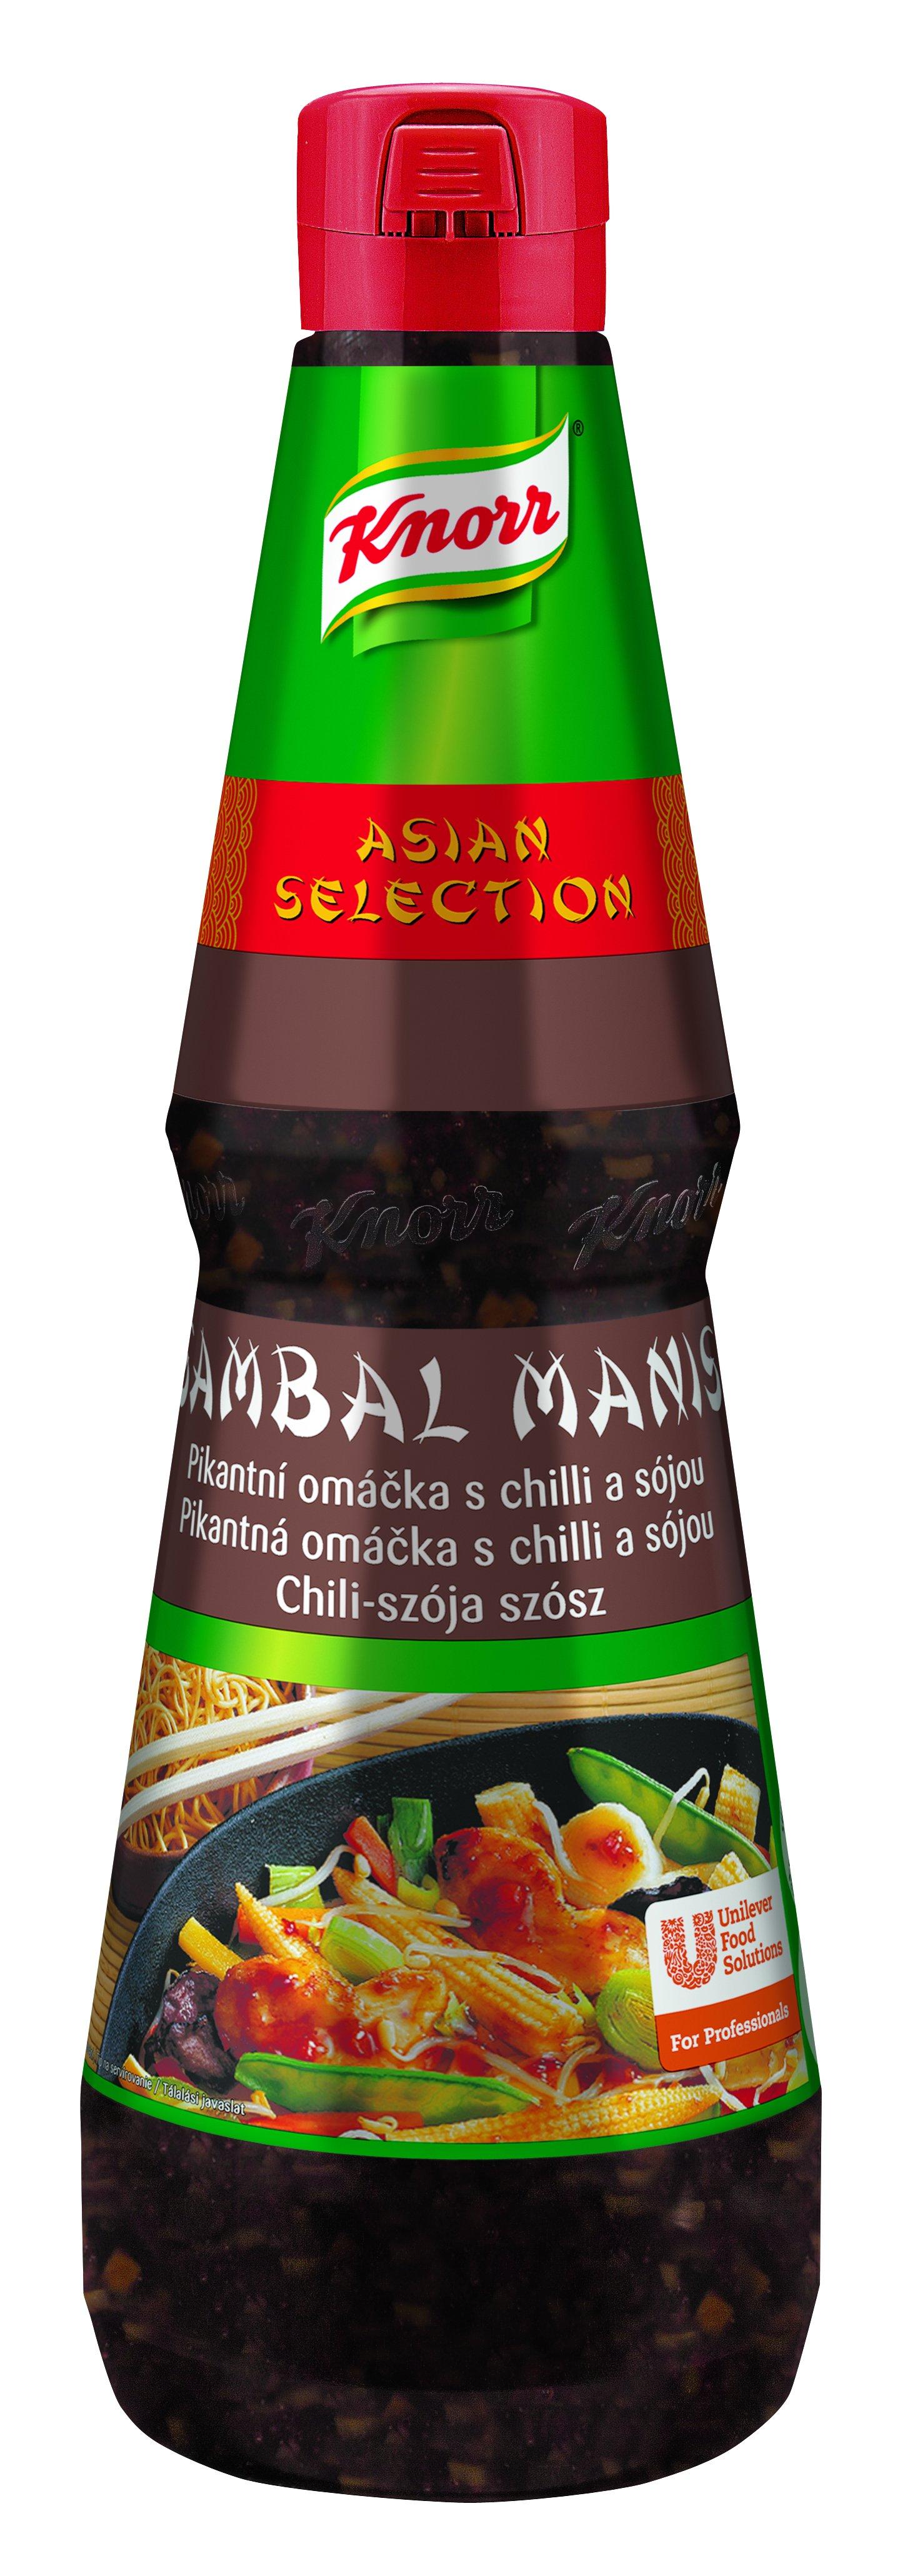 Knorr Sambal  Manis Omáčka chilli a sója 1L